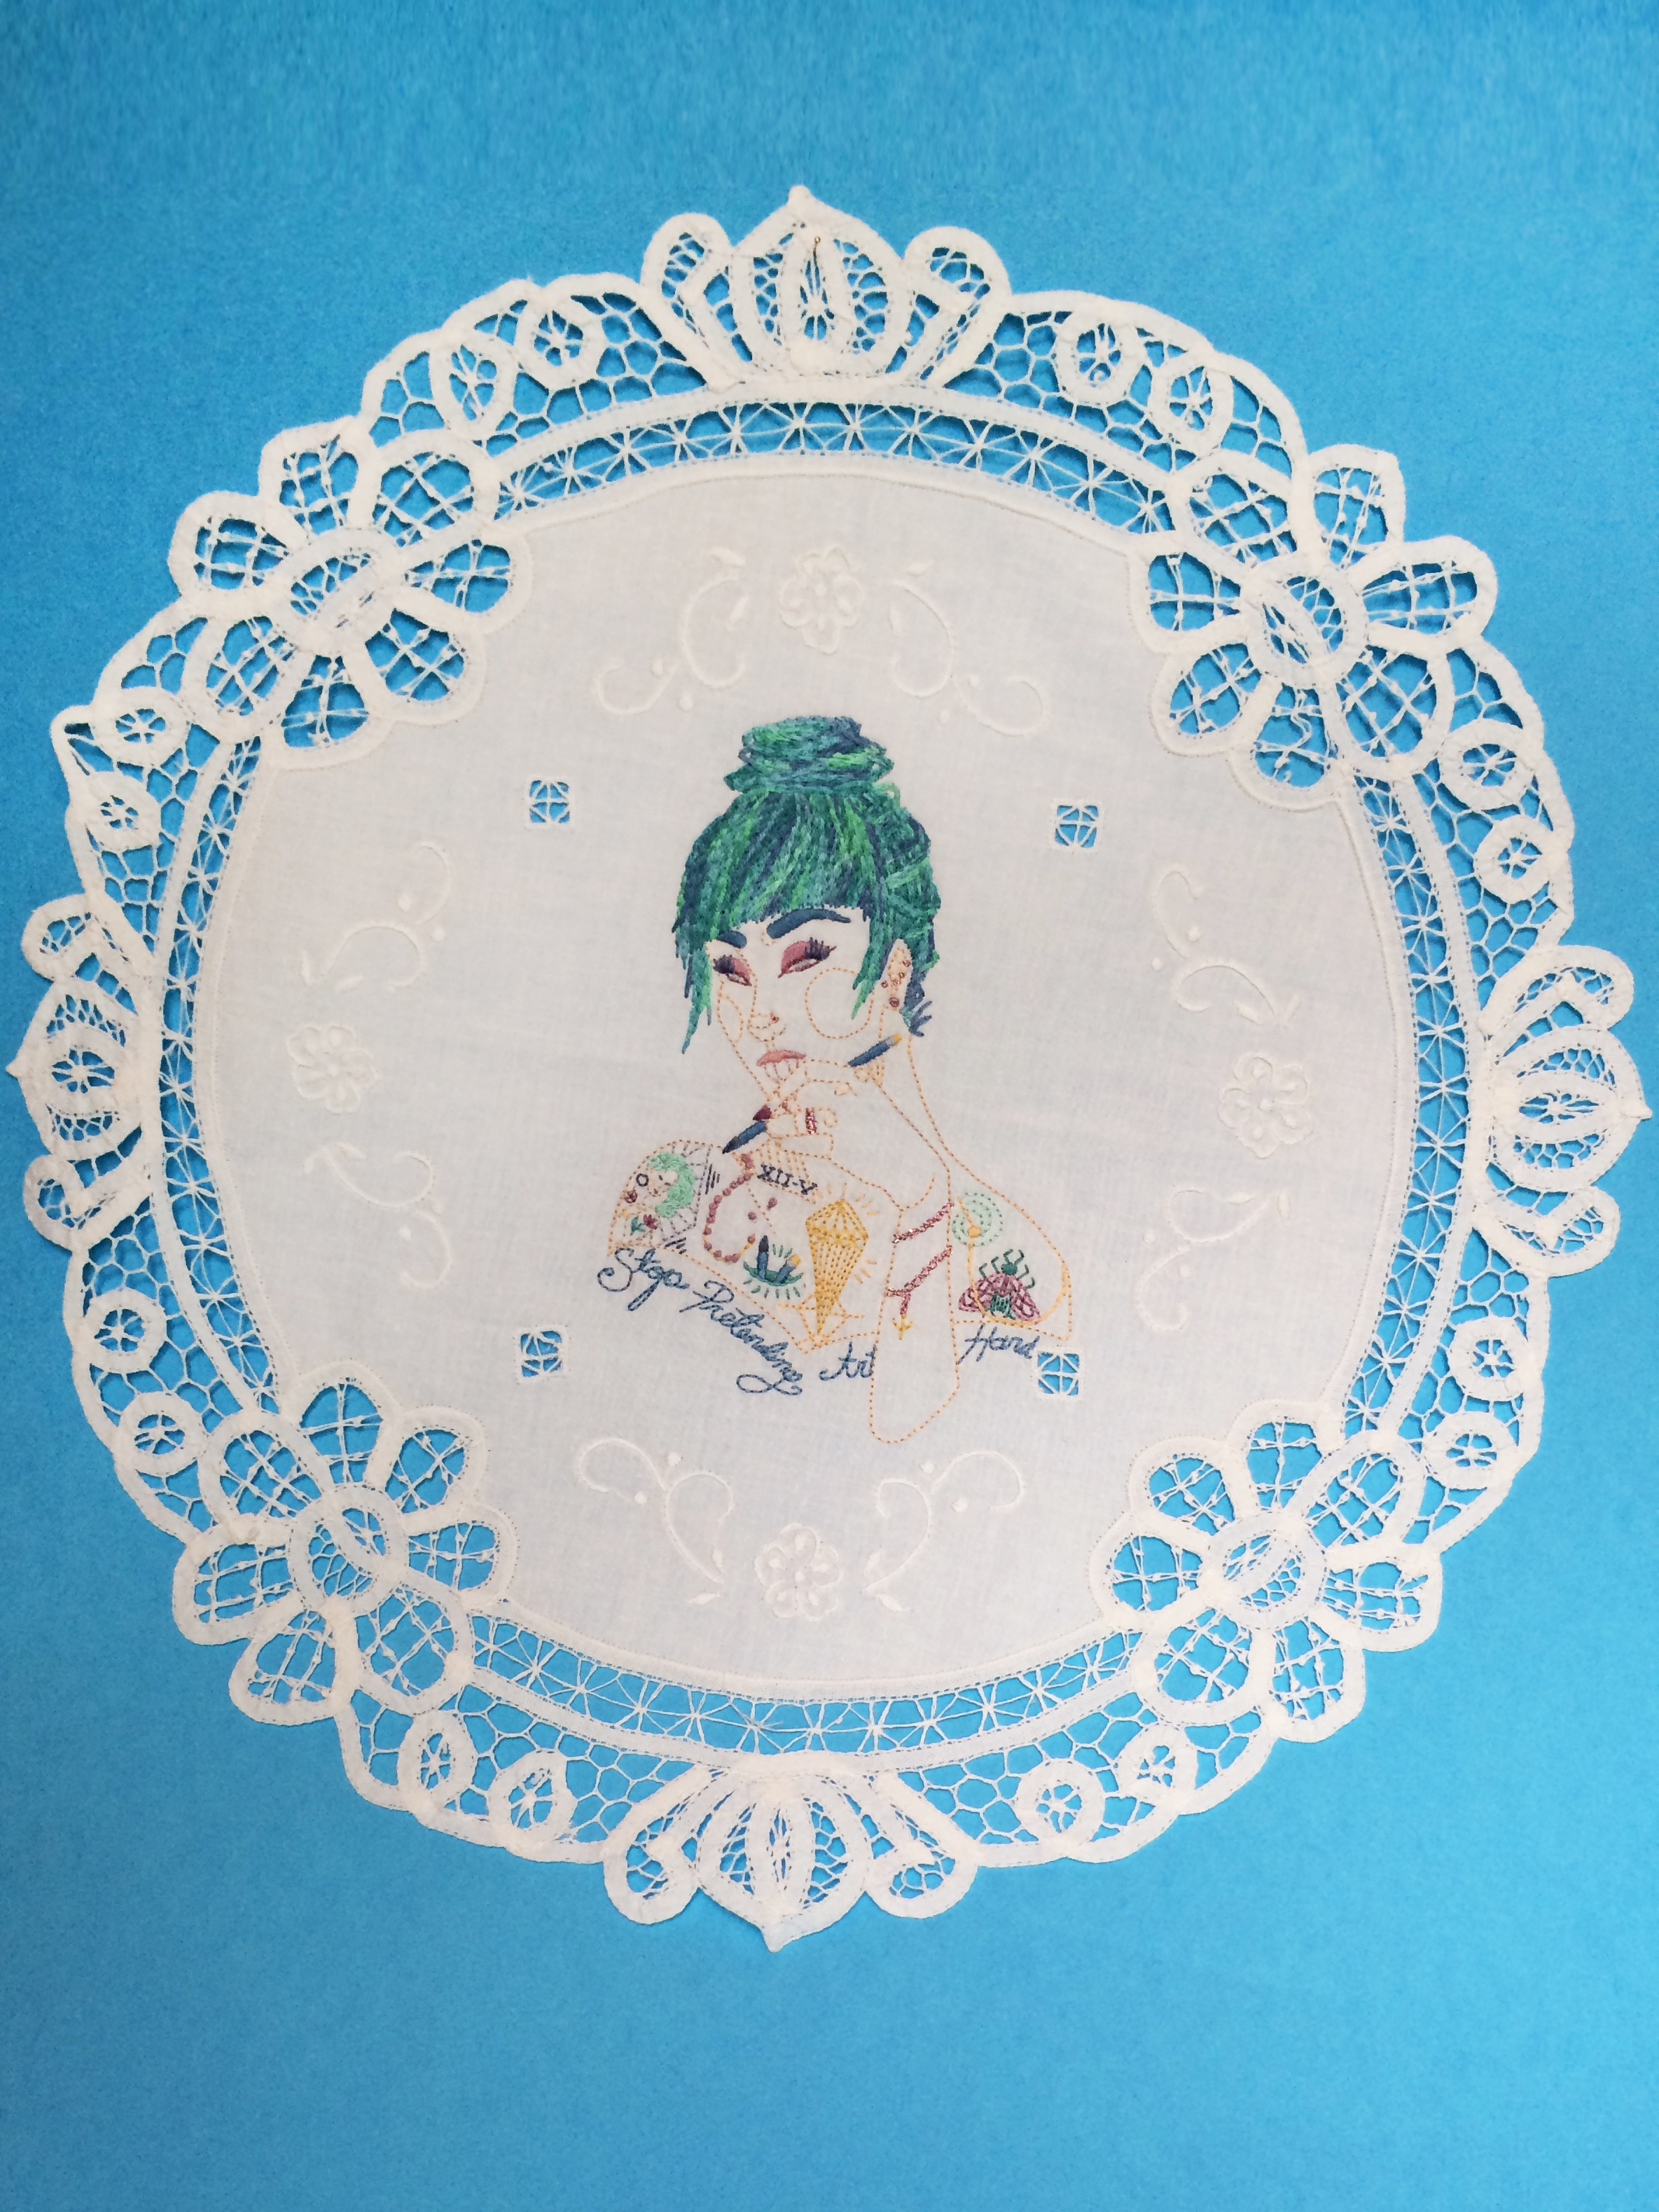 "Amanda  ,   Embroidered Illustration on Vintage Lace. 18""x18""  . 2015."